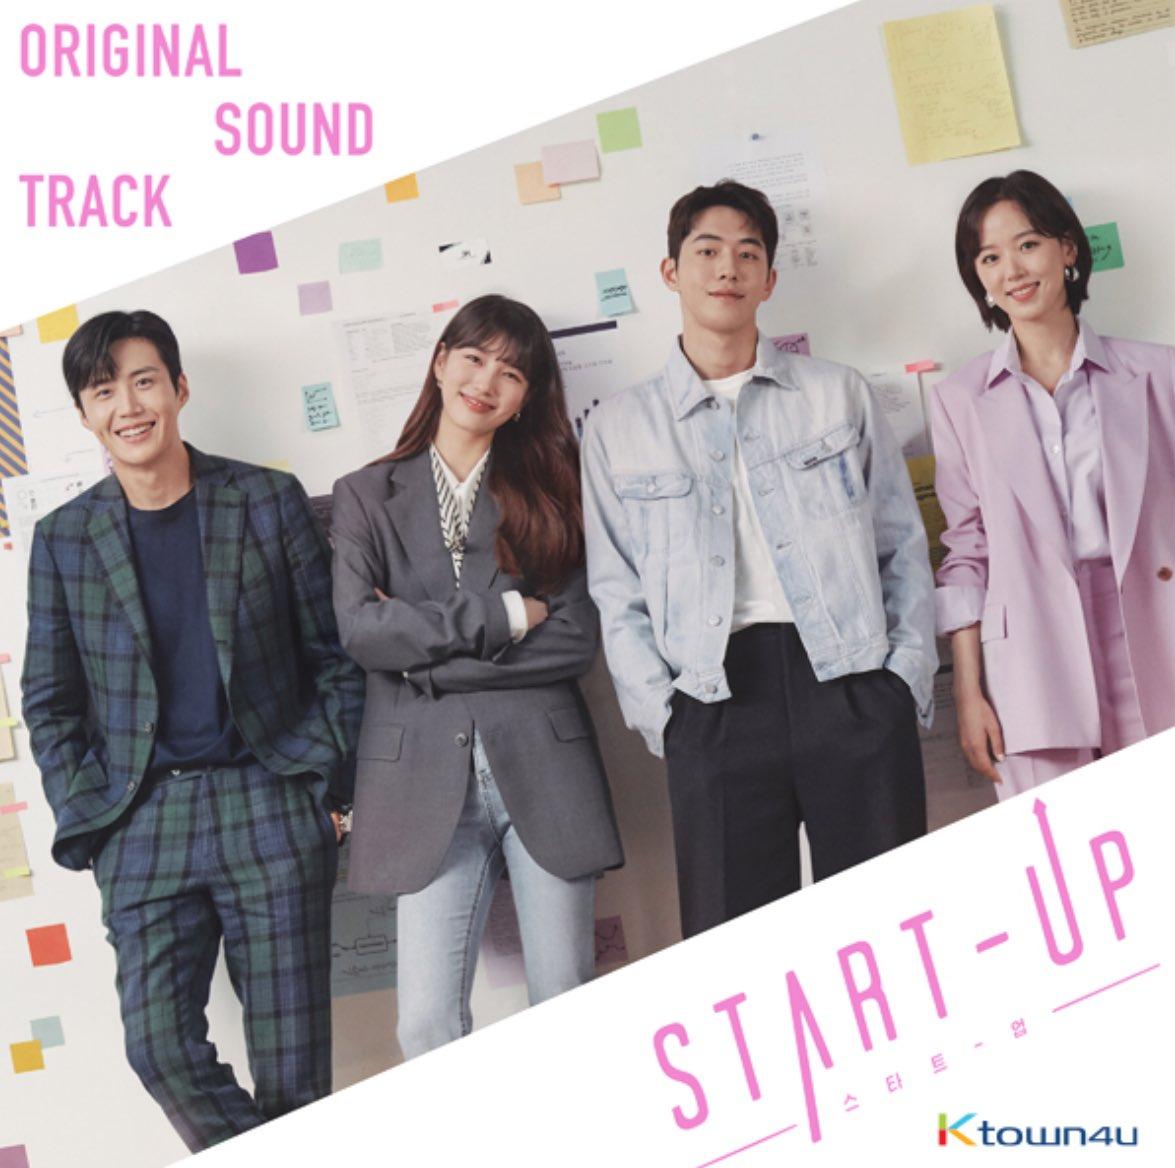 (Pre Order) OST.Start Up ✨  💜890฿  (มัดจำ 500/บั้ม) 🚗ค่าส่ง Flash 90฿ ต่อไป +20 ✅รวมภาษี ✅มีของแถม  👑สนใจเดมมานะคะ ❗️ ❌ปิดรับ 26.01❌ #Startup #ตลาดนัดรวมด้อม